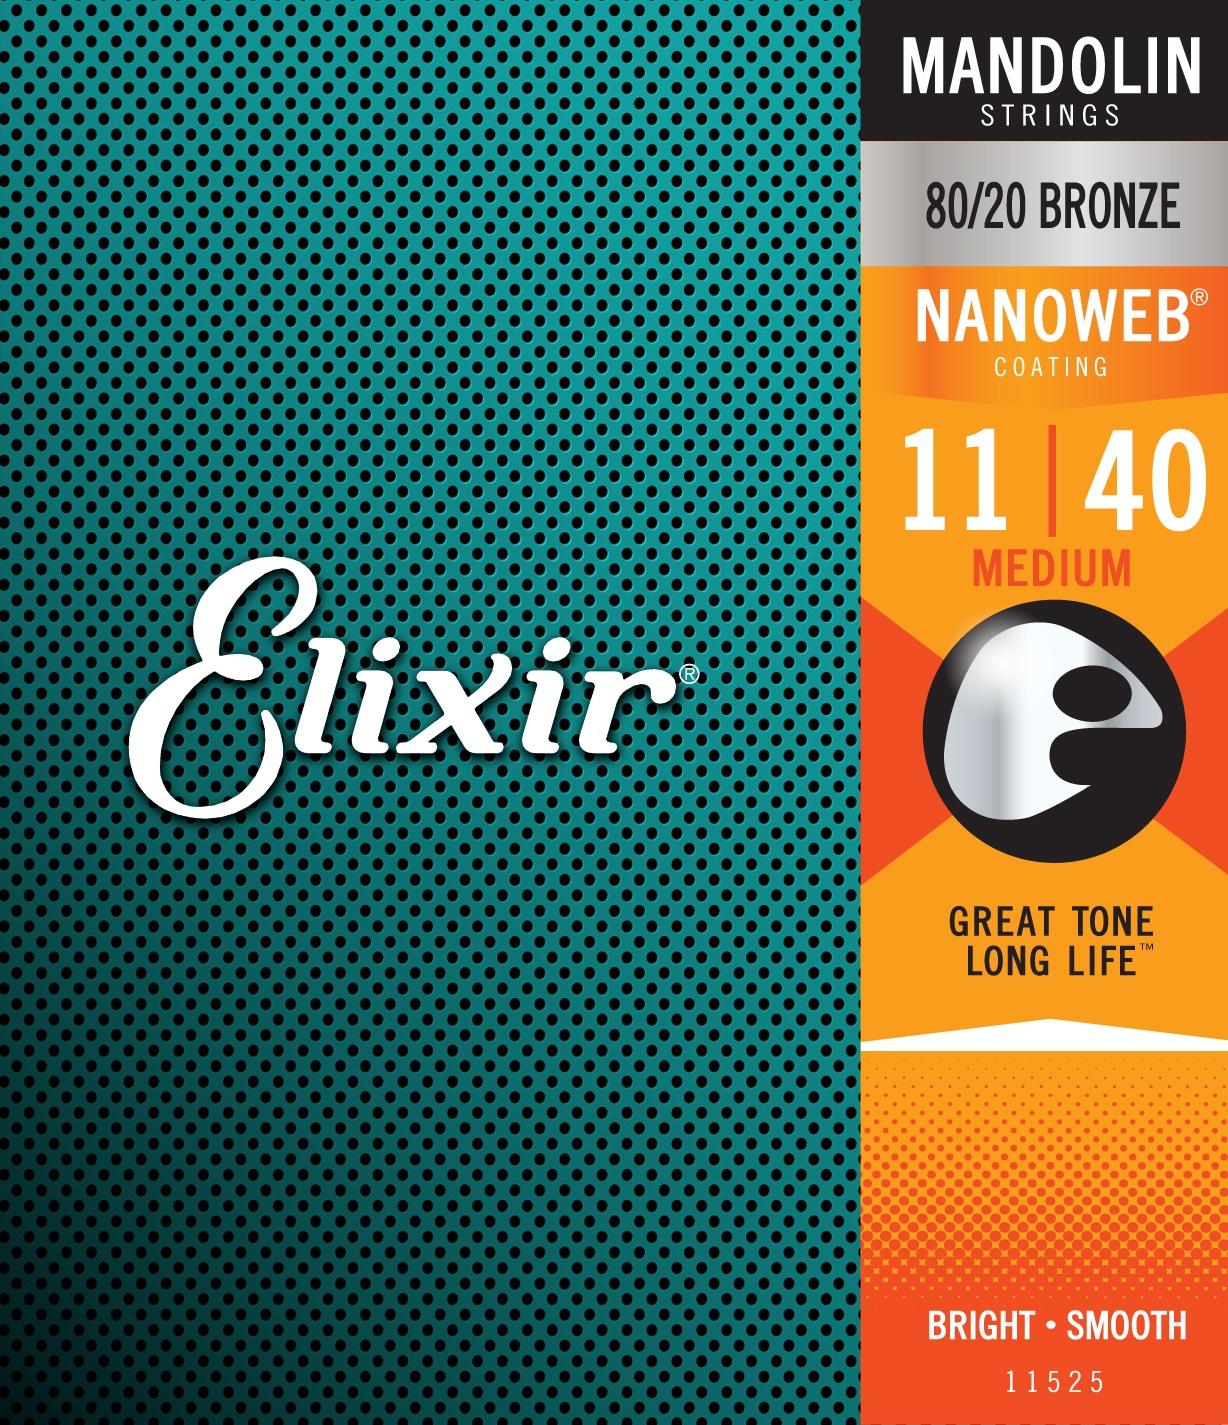 Elixir Nanoweb 80/20 Bronze Mandolin Medium